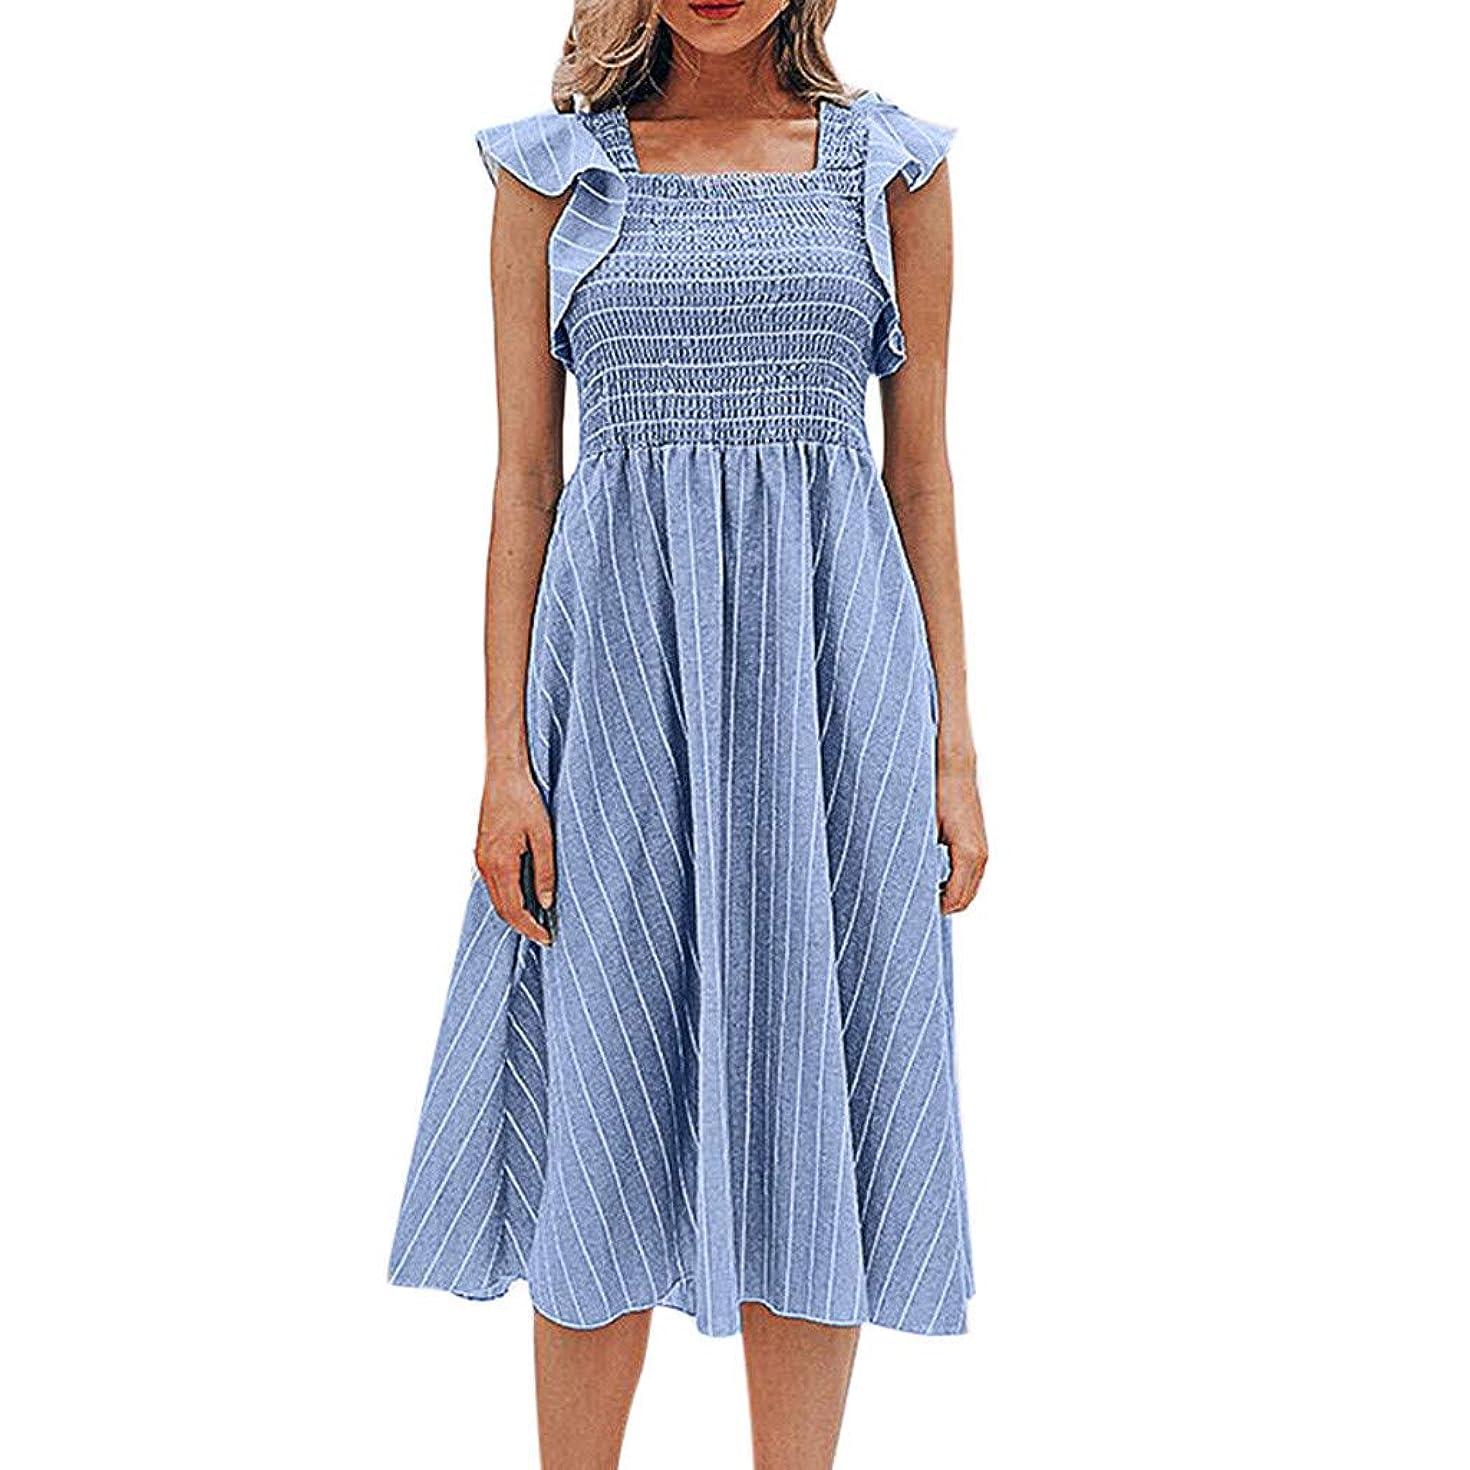 Tronet Summer Casual Dresses,Fashion Womens Beach Ruffles Sleeve Ladies Square Collar Stripe Print Long Dress